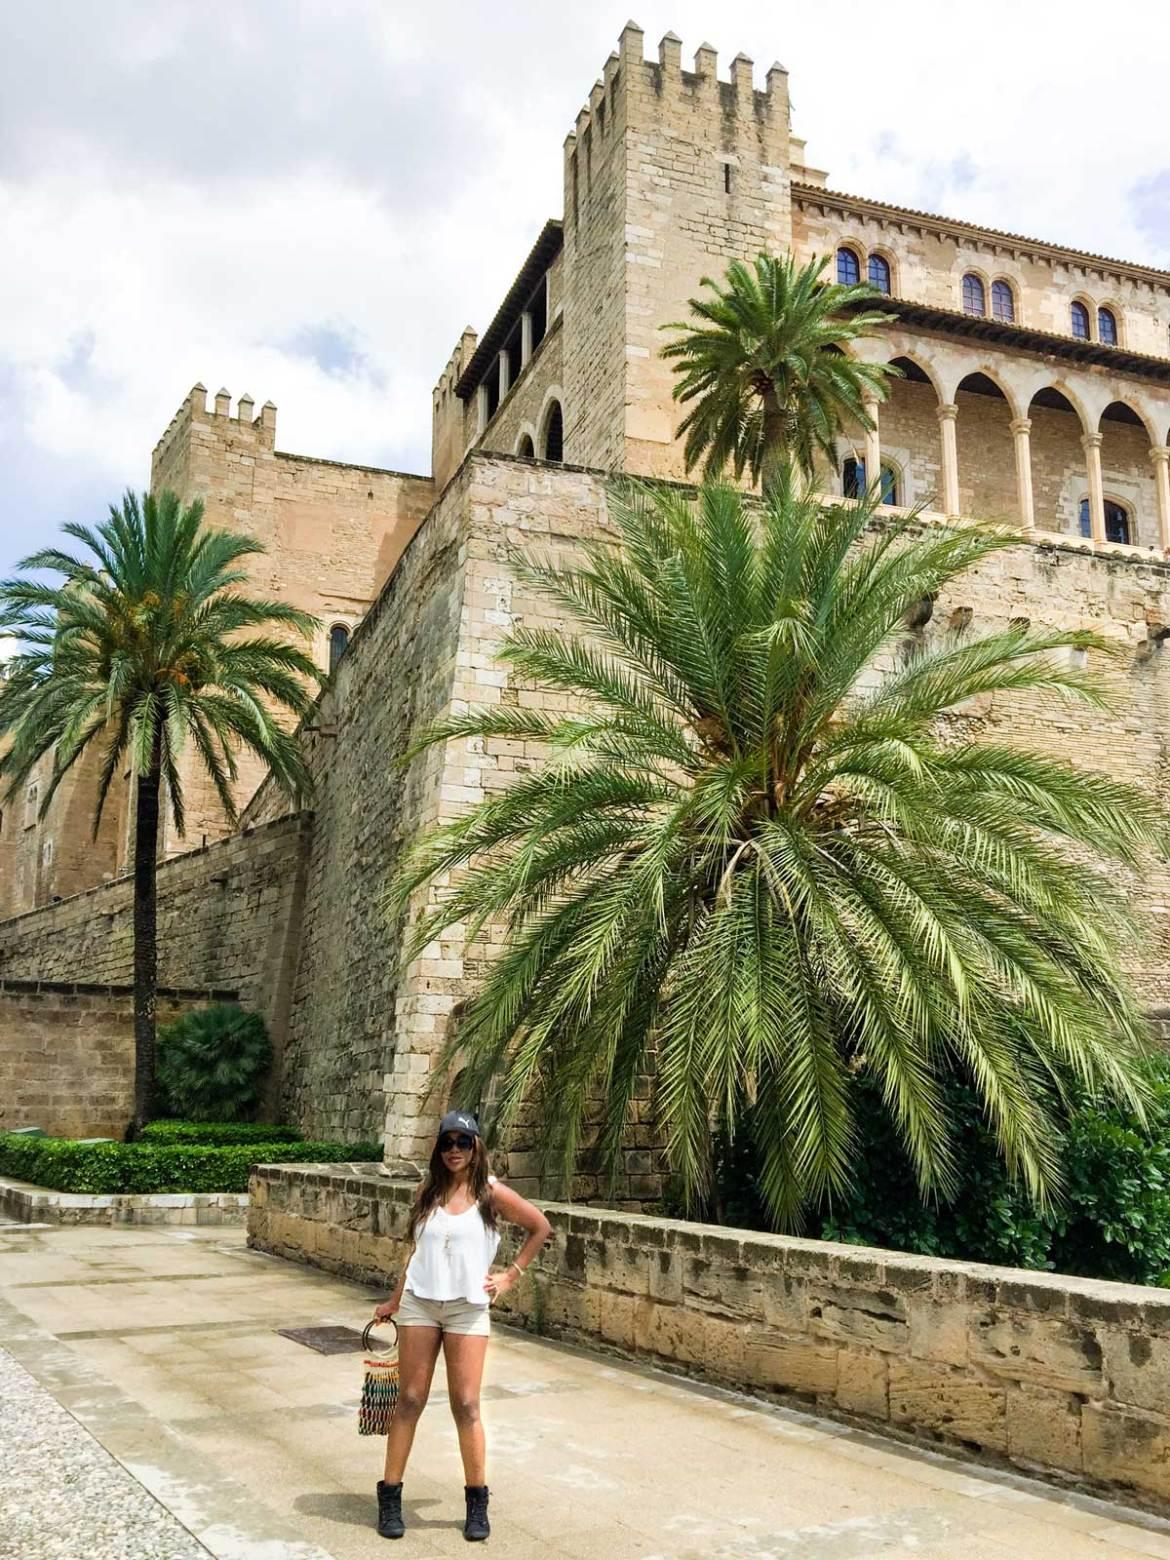 Travel Guide: 63 Things to do in Palma de